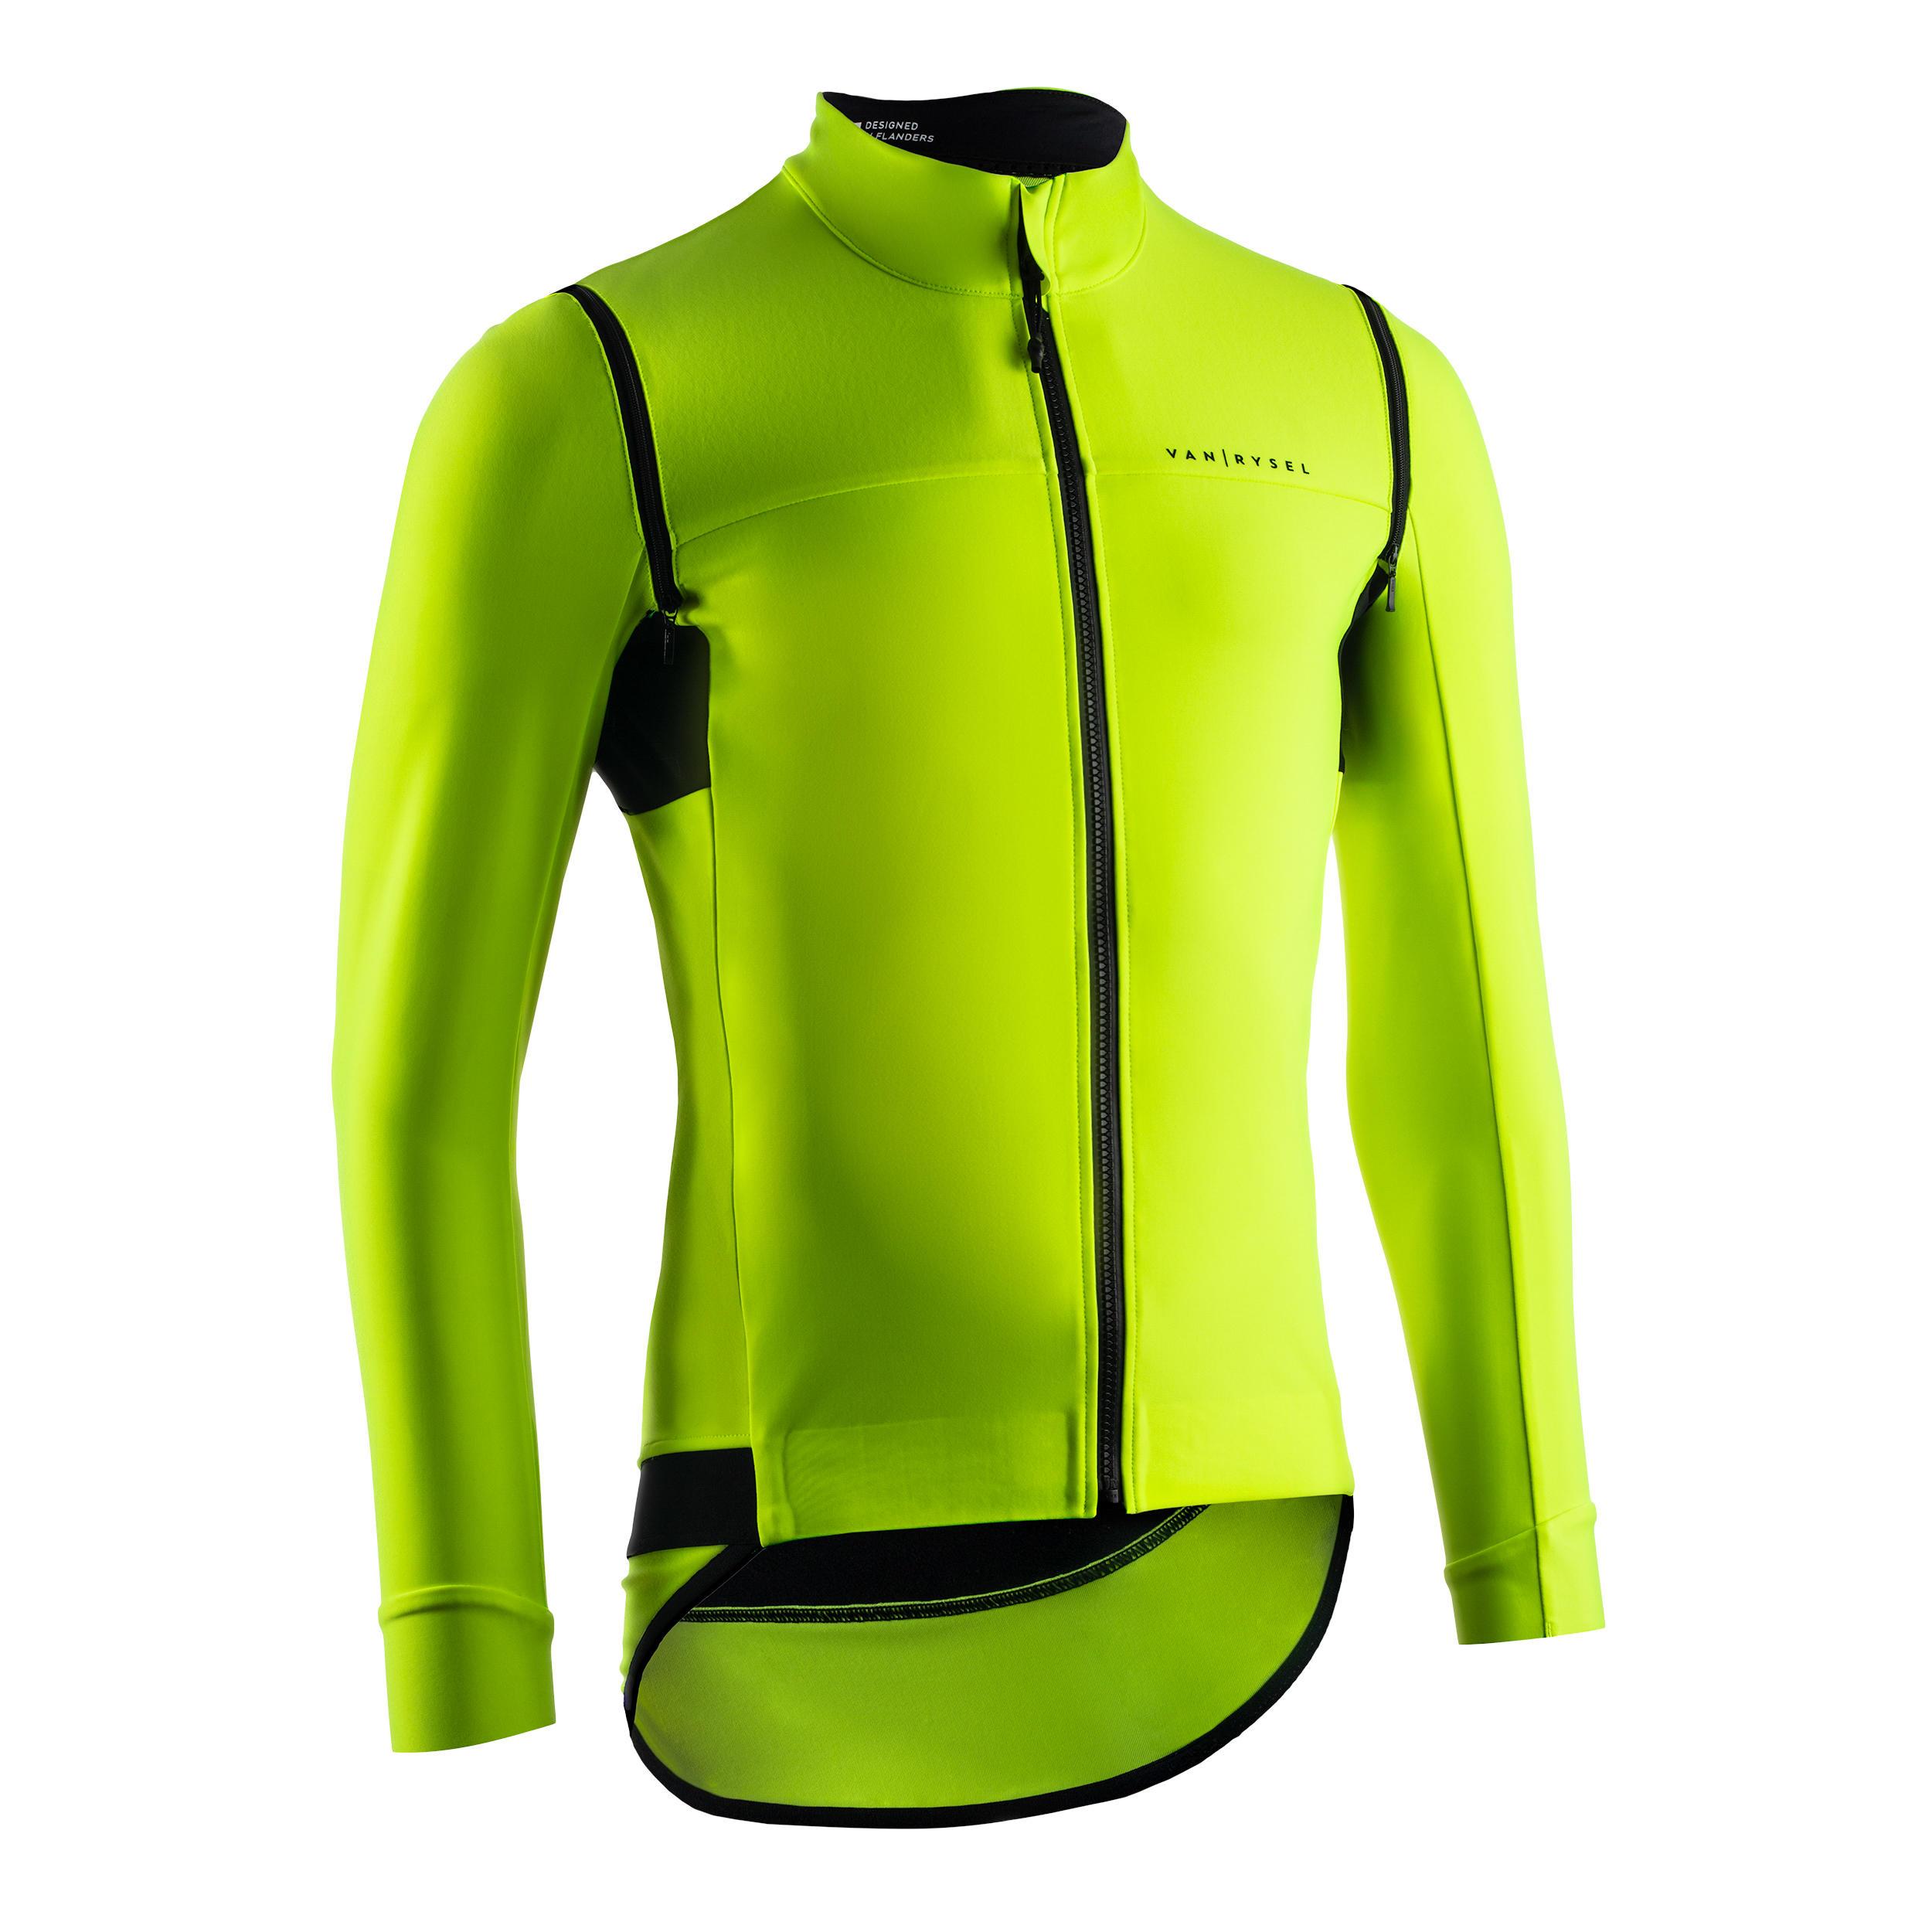 Jachetă ciclism RACER imagine produs